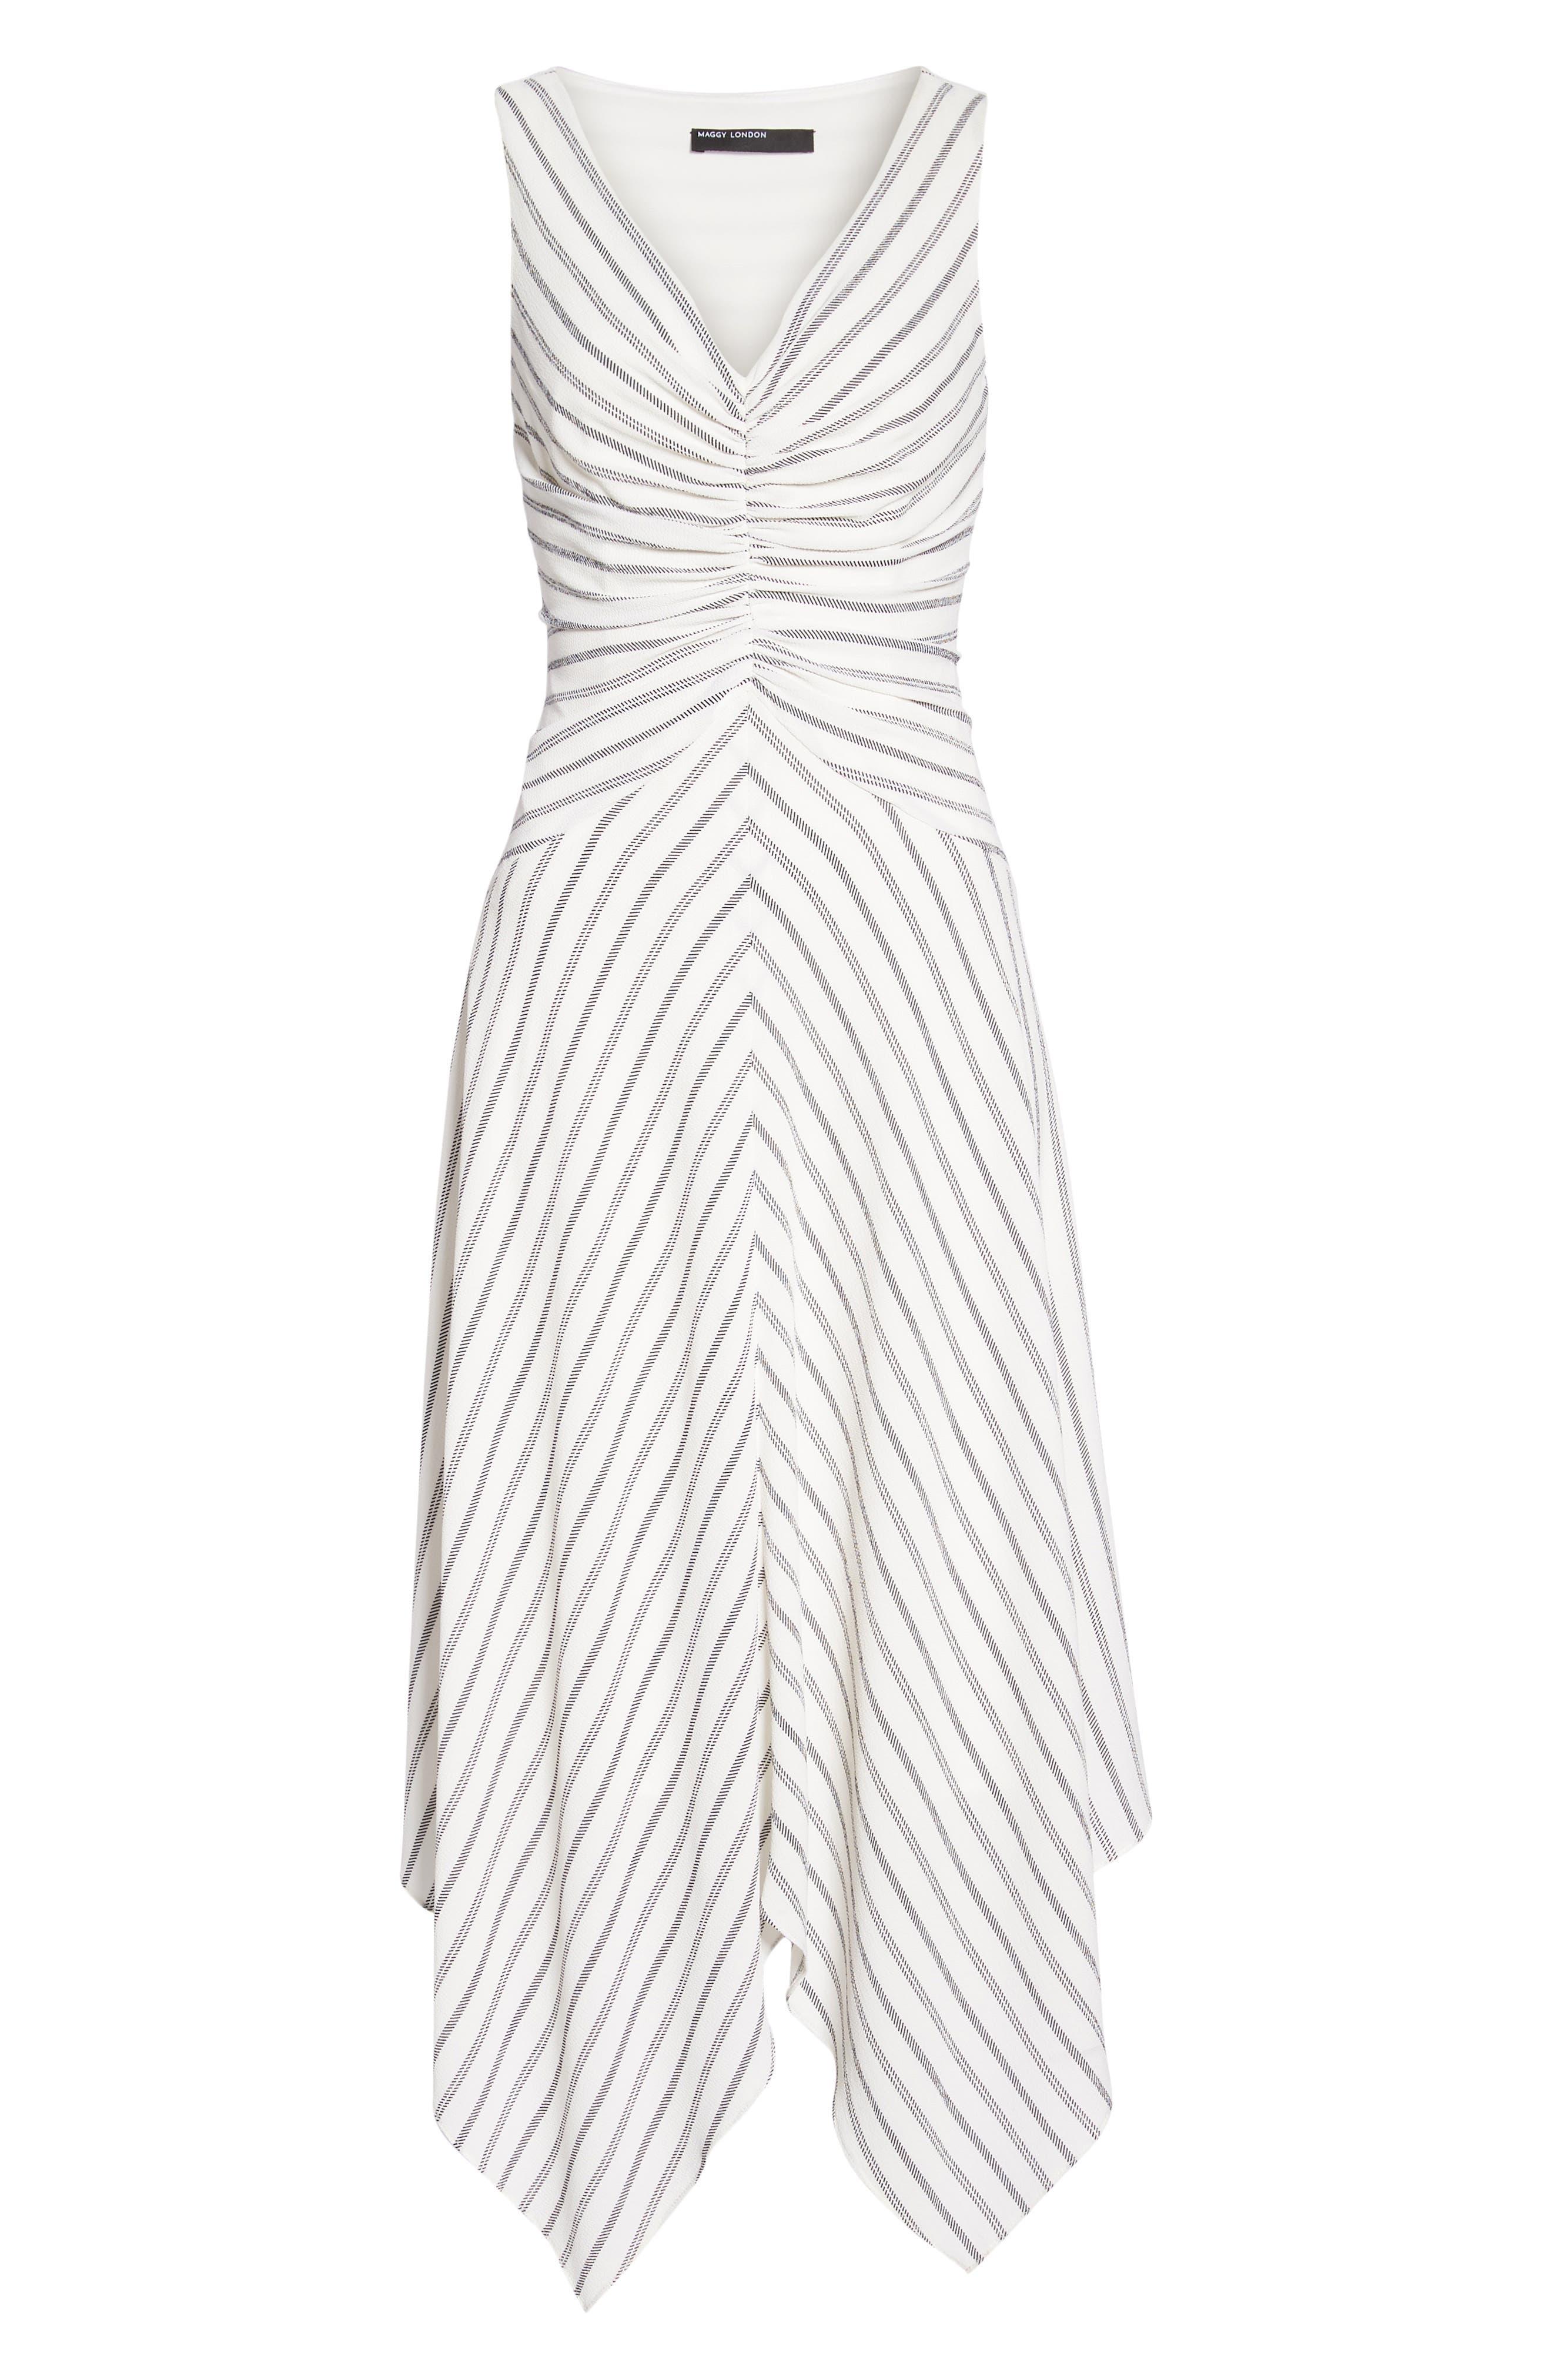 Stripe Ruched Handkerchief Hem Dress,                             Alternate thumbnail 7, color,                             Soft White/ Black